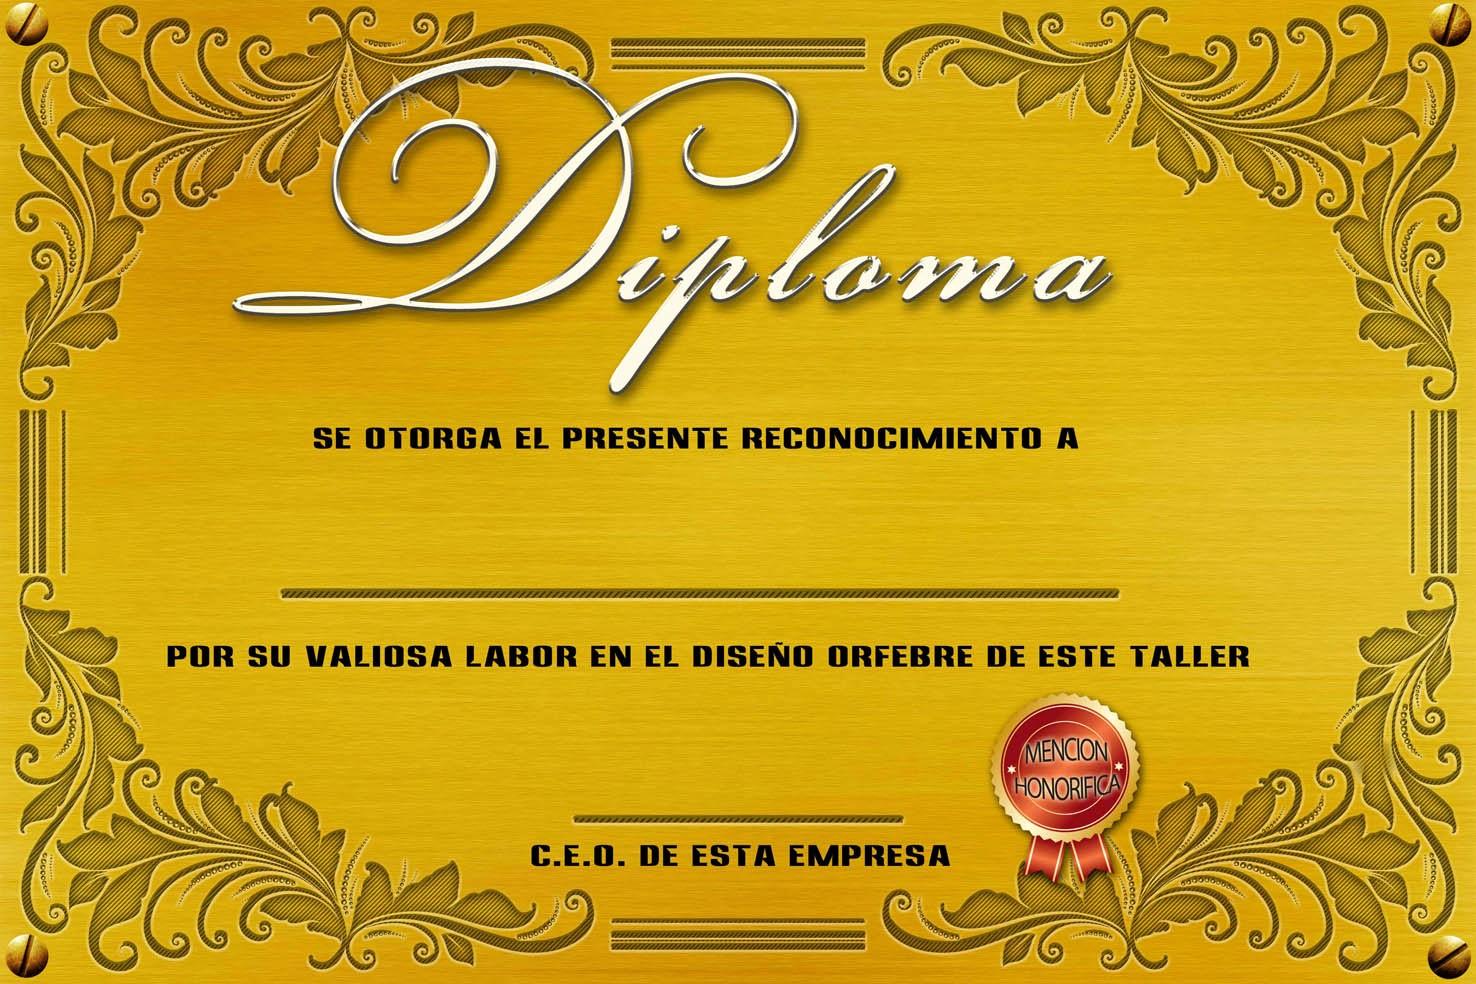 Plantillas De Diplomas Para Editar Elegant Diplomas Para Editar En Photoshop